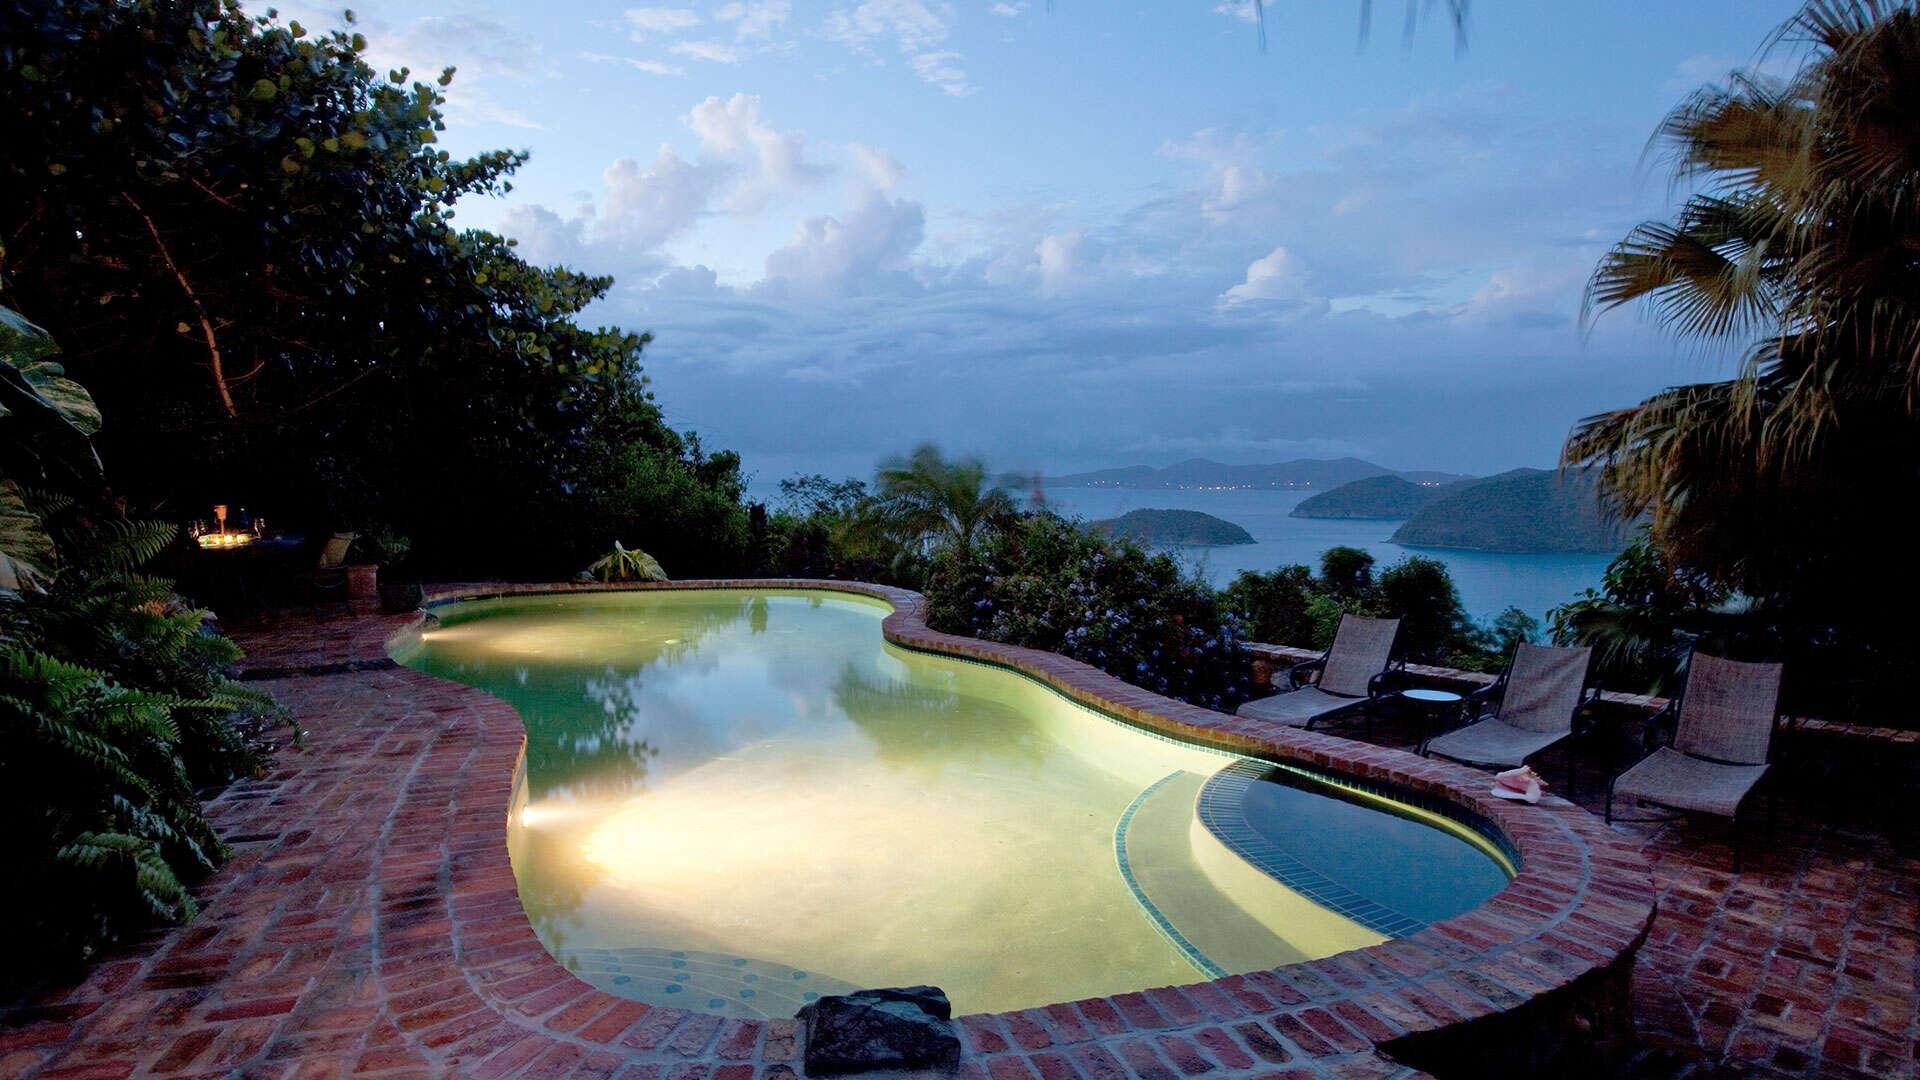 Luxury villa rentals caribbean - Usvi - St john - Catherineberg - Hakuna Matata - Image 1/16